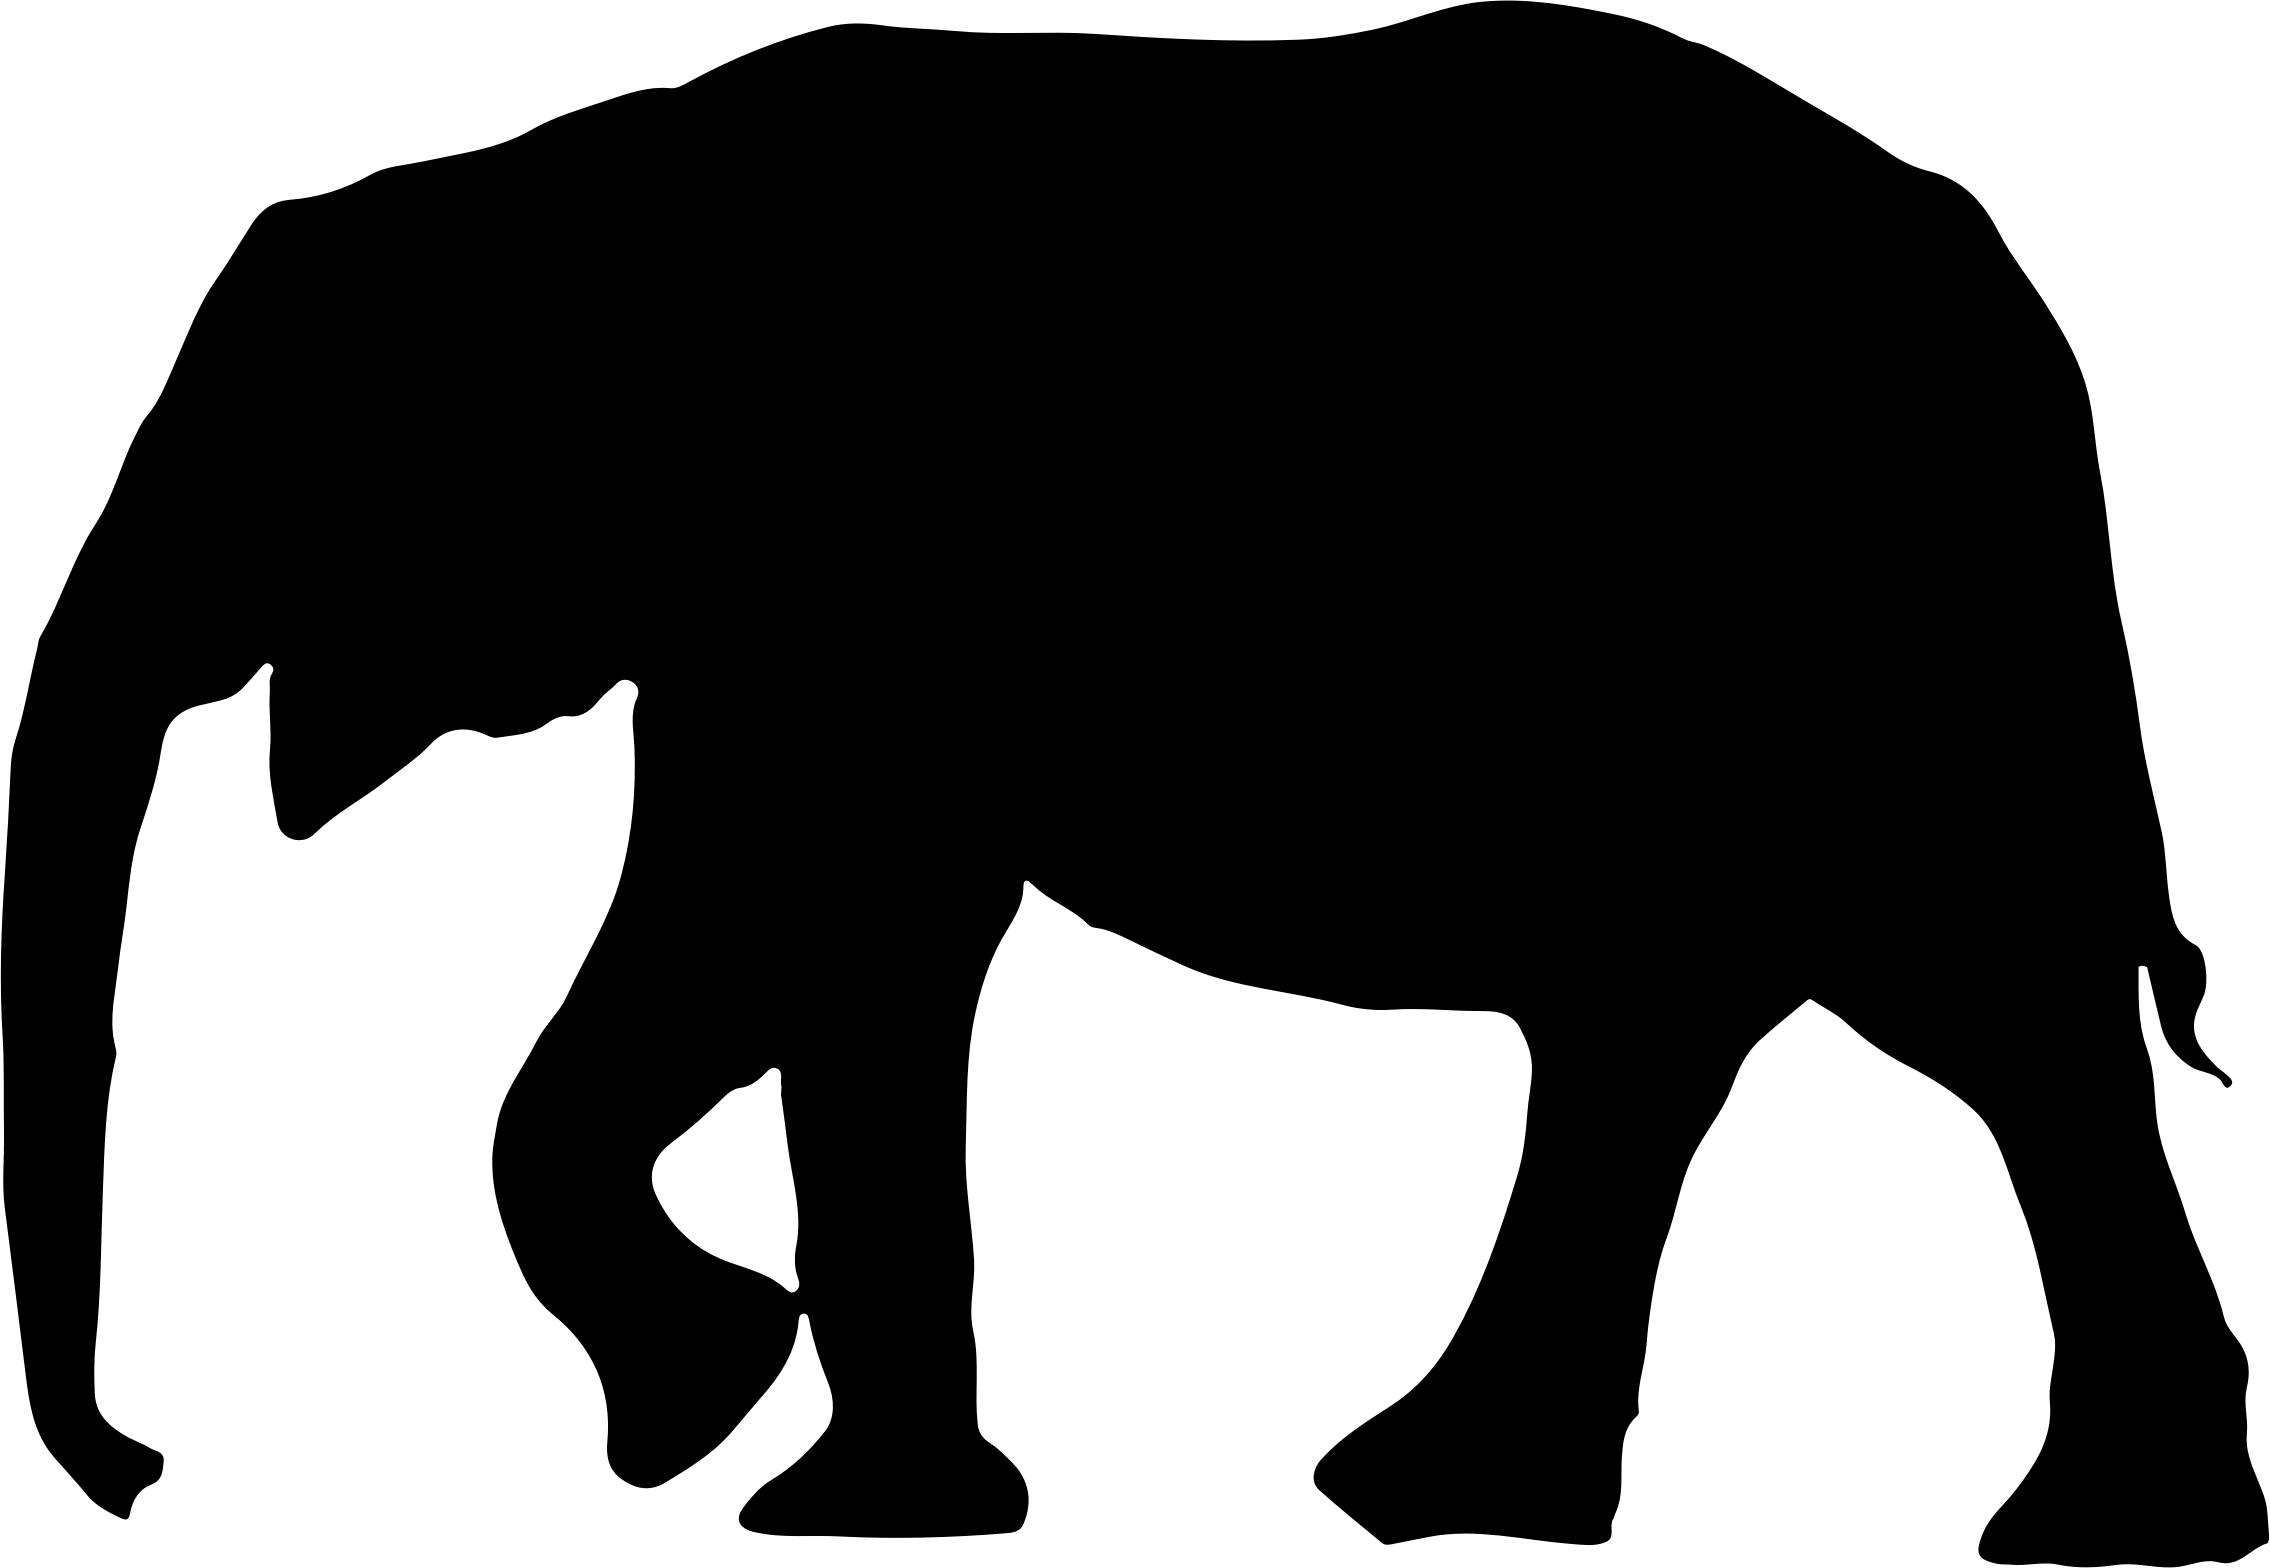 2270x1568 Clipart